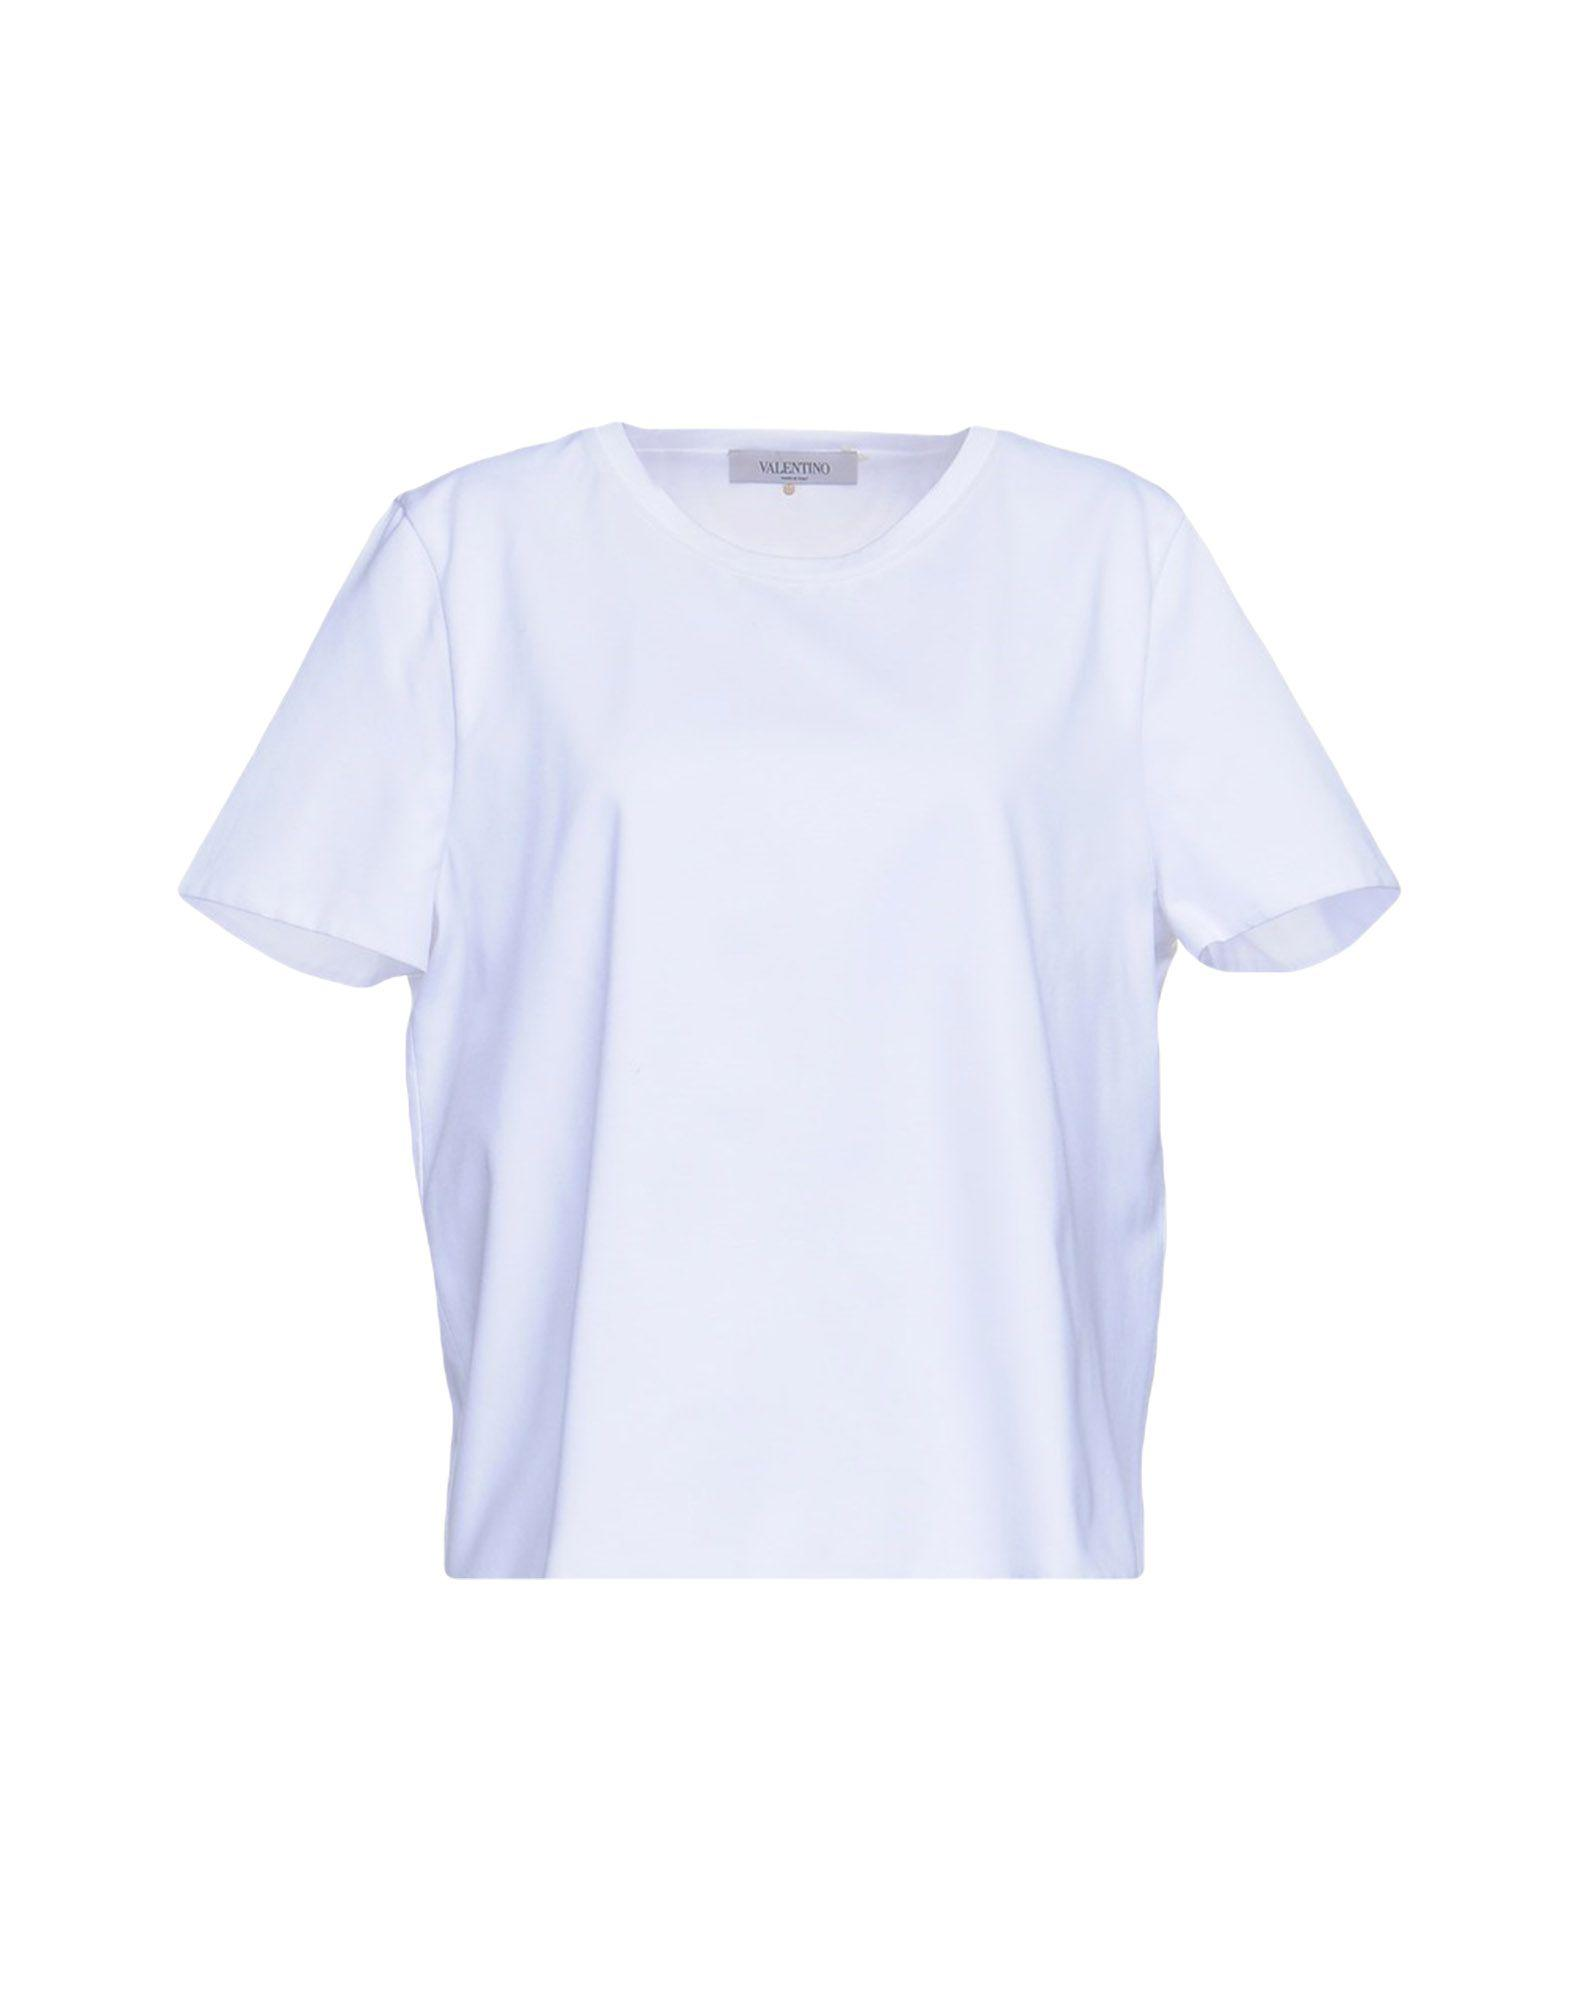 Valentino T-shirt In White